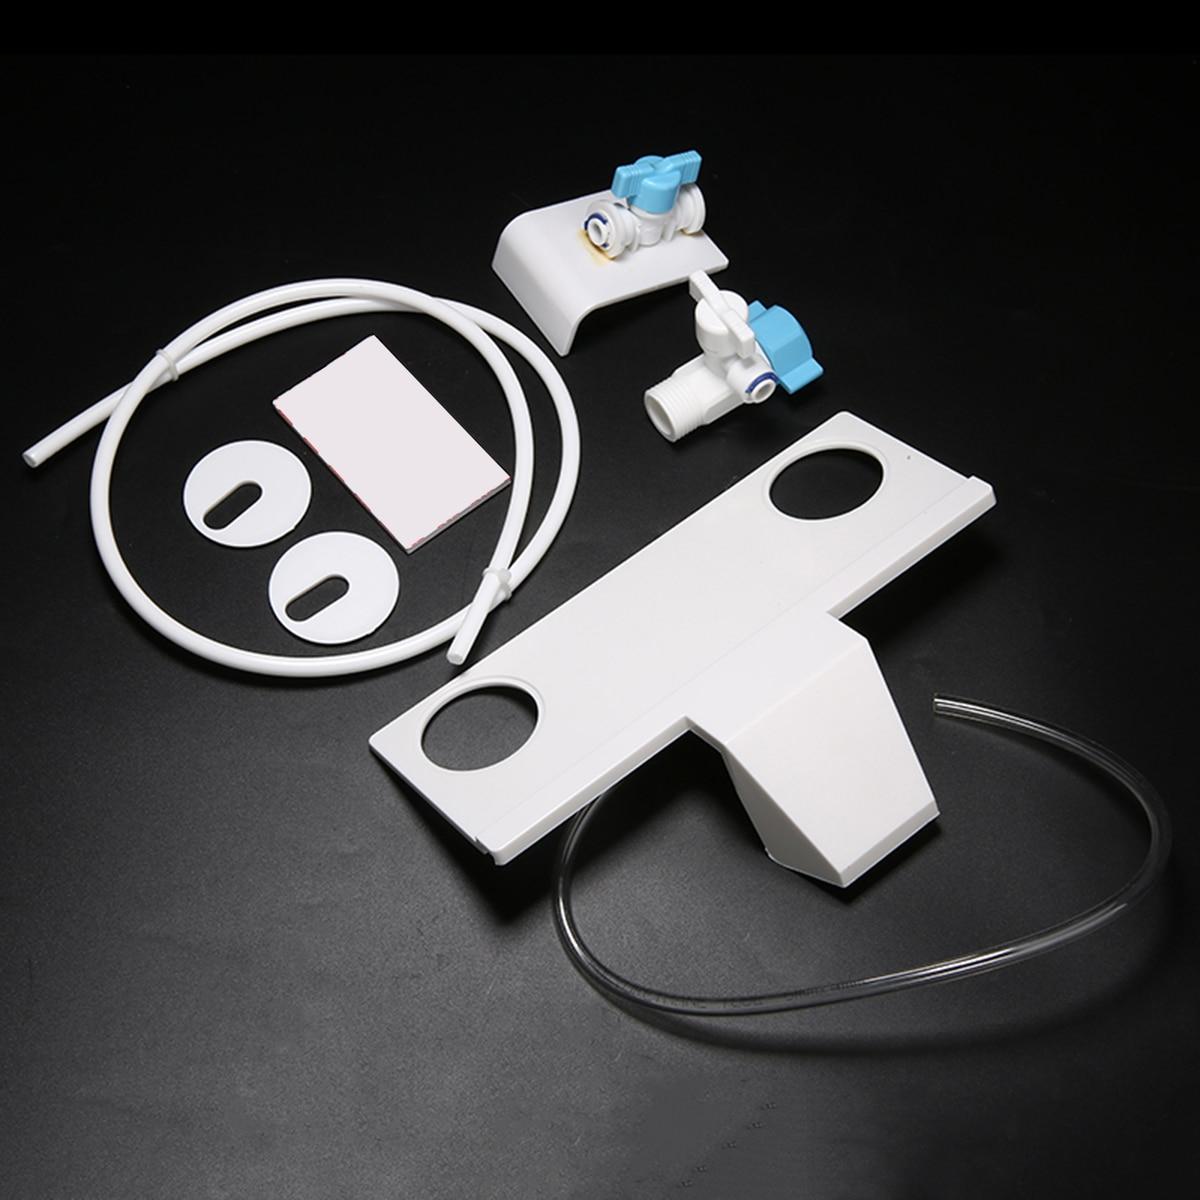 Mayitr 1set Toilet Bidet Water Spray Seat Non-Electric Toilet Sprayer Nozzle Attachment Hand Operation Bidet Parts New